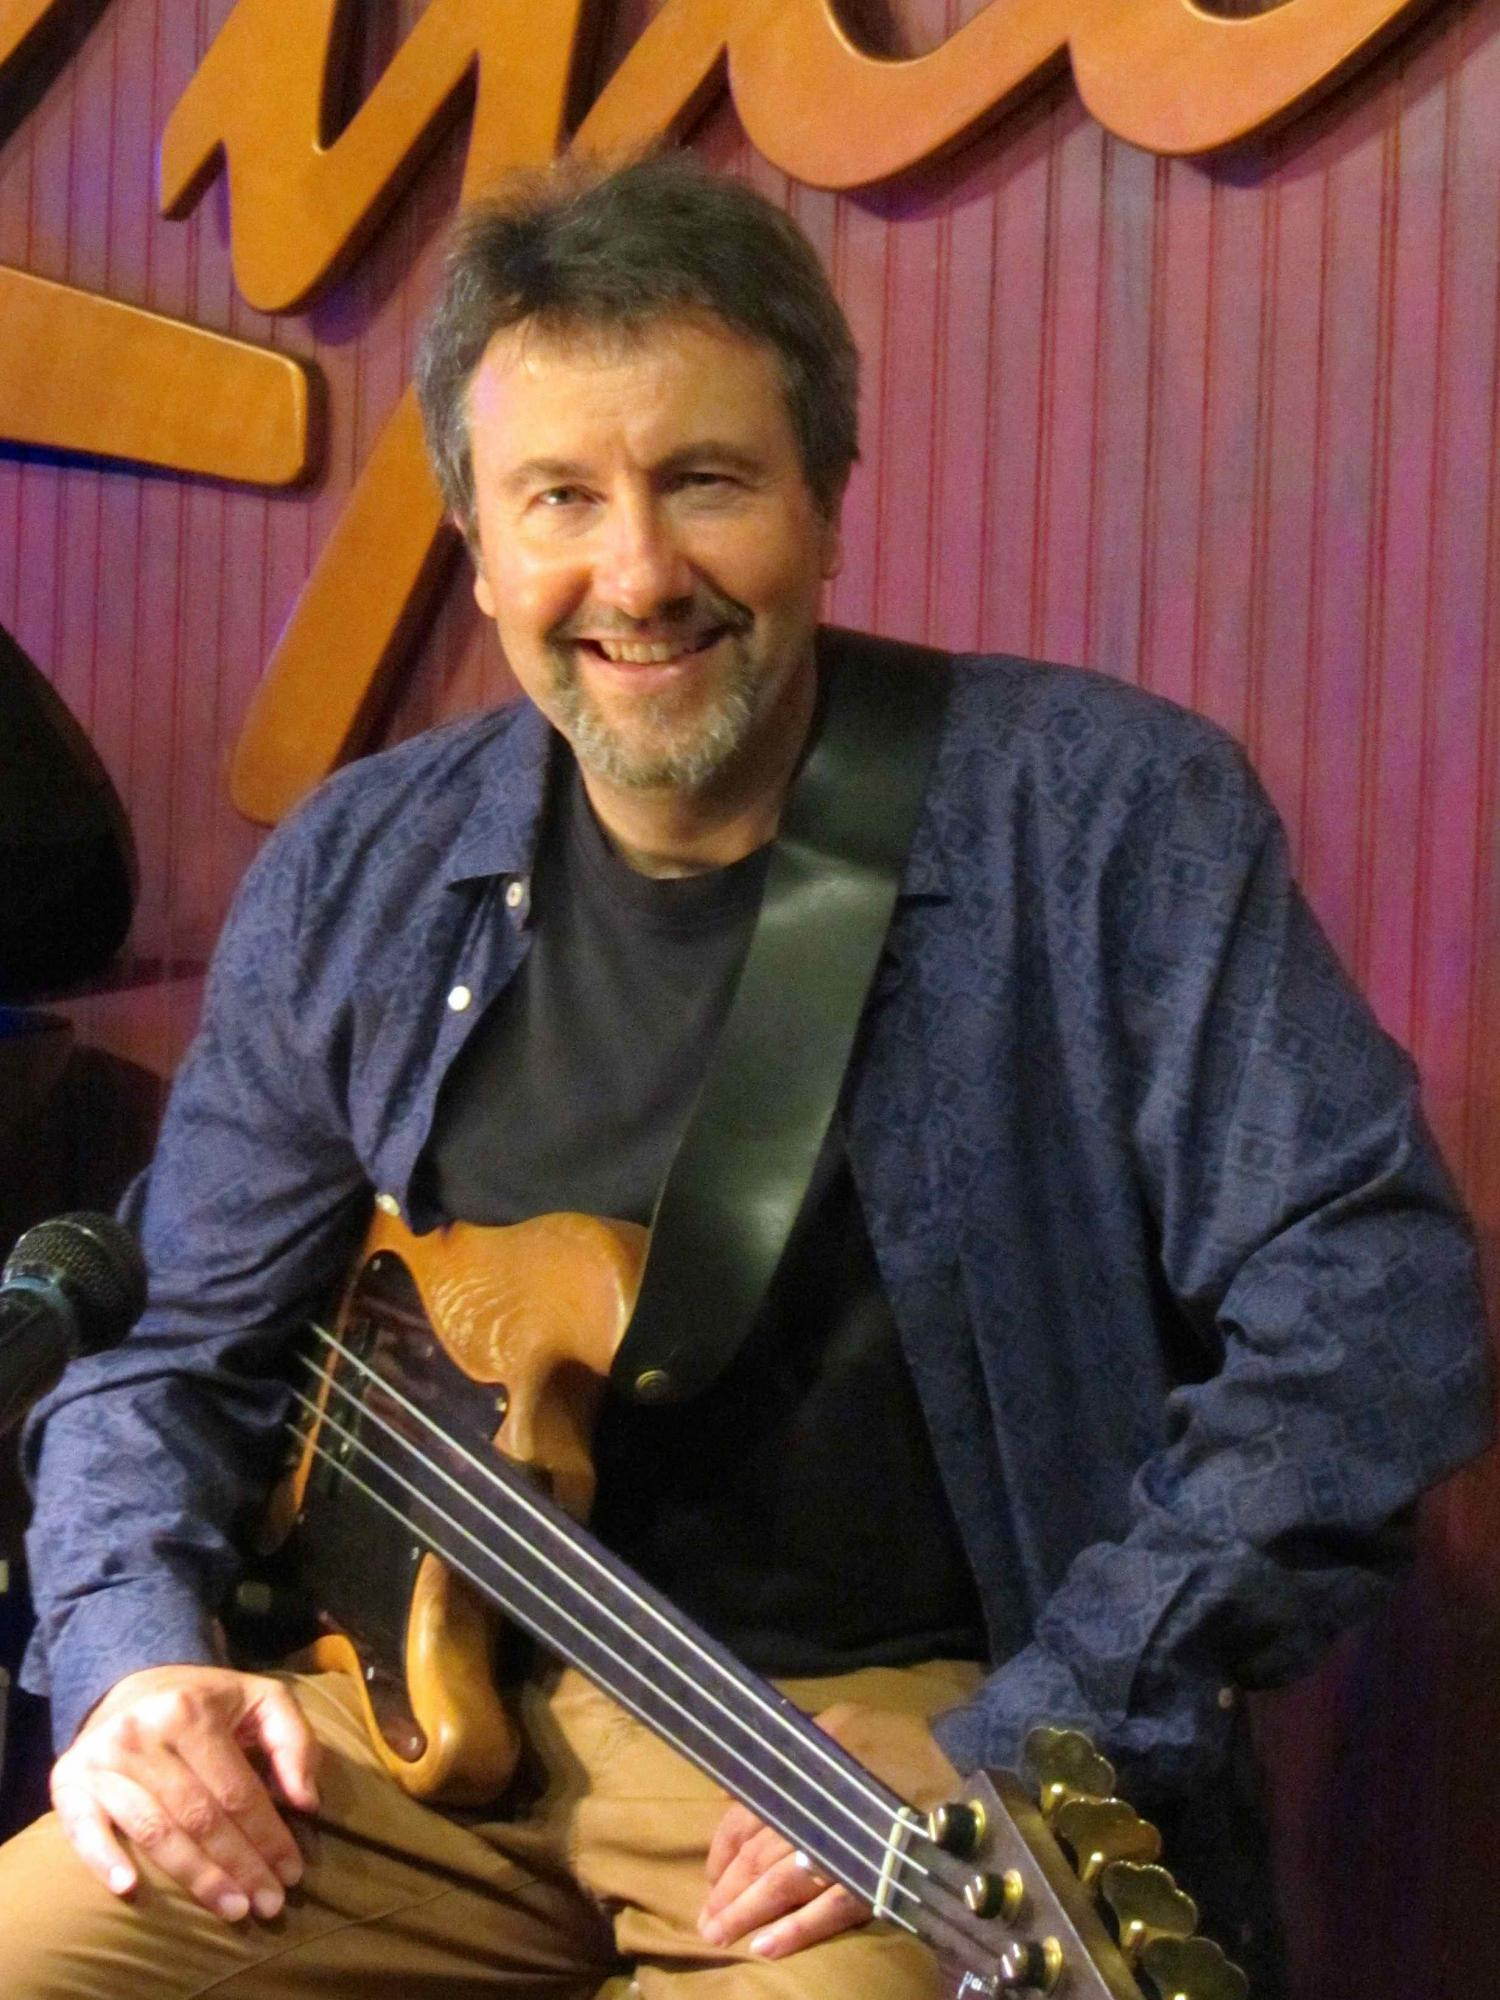 The Manuel Kaufmann Jazz Orchestra Presents: Tributes